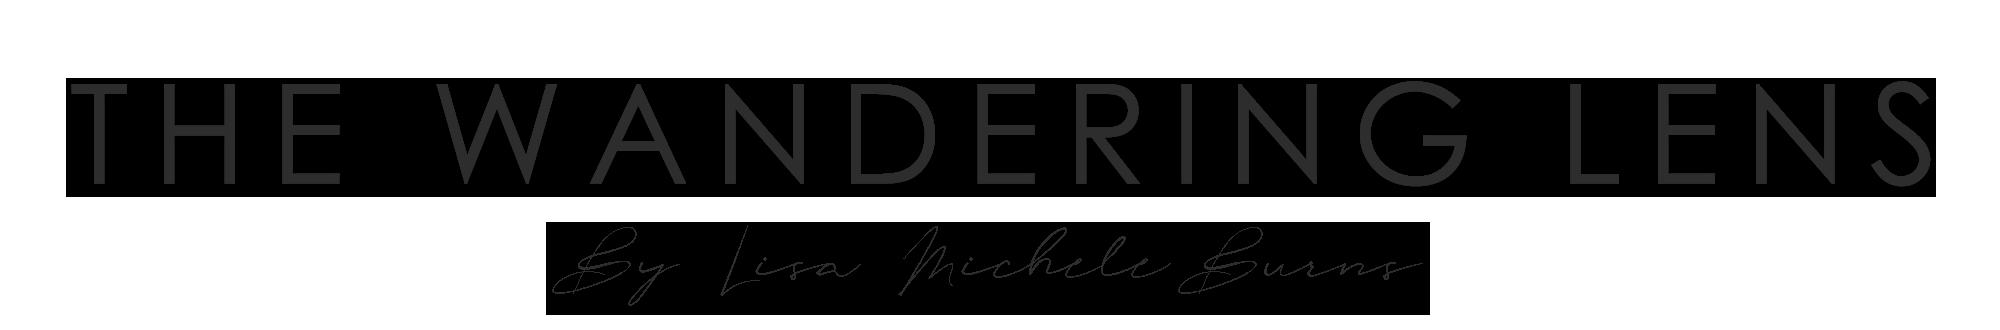 The Wandering Lens Logo